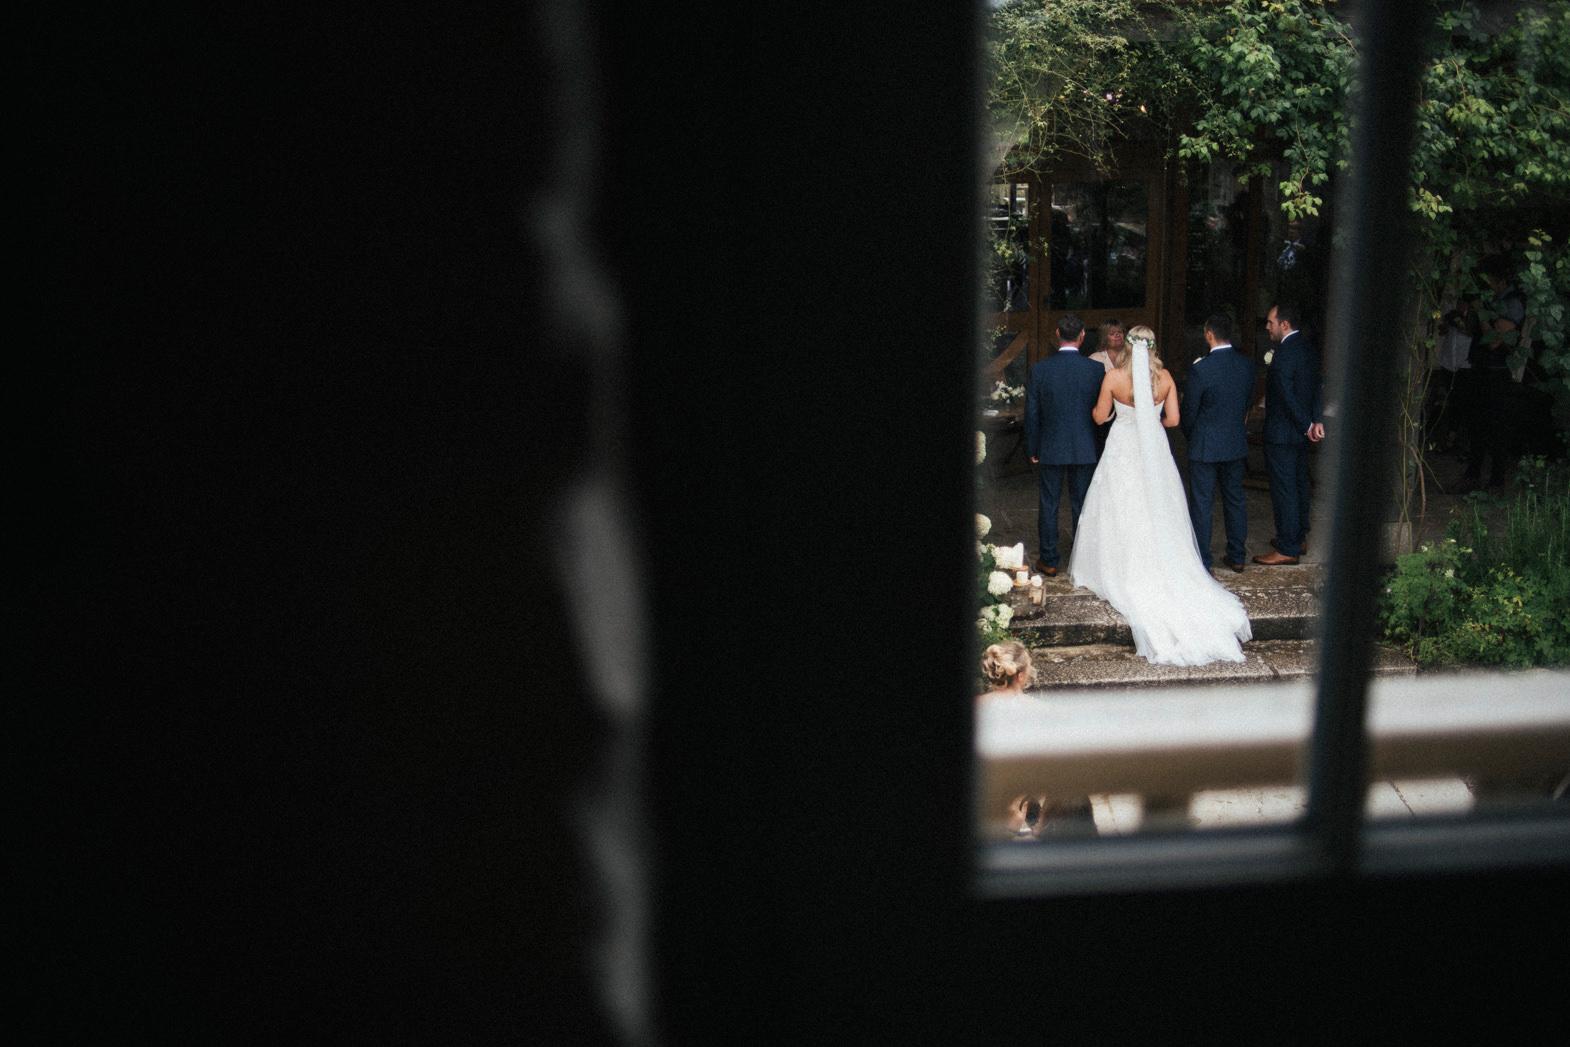 WEDDING PHOTOGRAPHY AT NANCARROW FARM (58).jpg